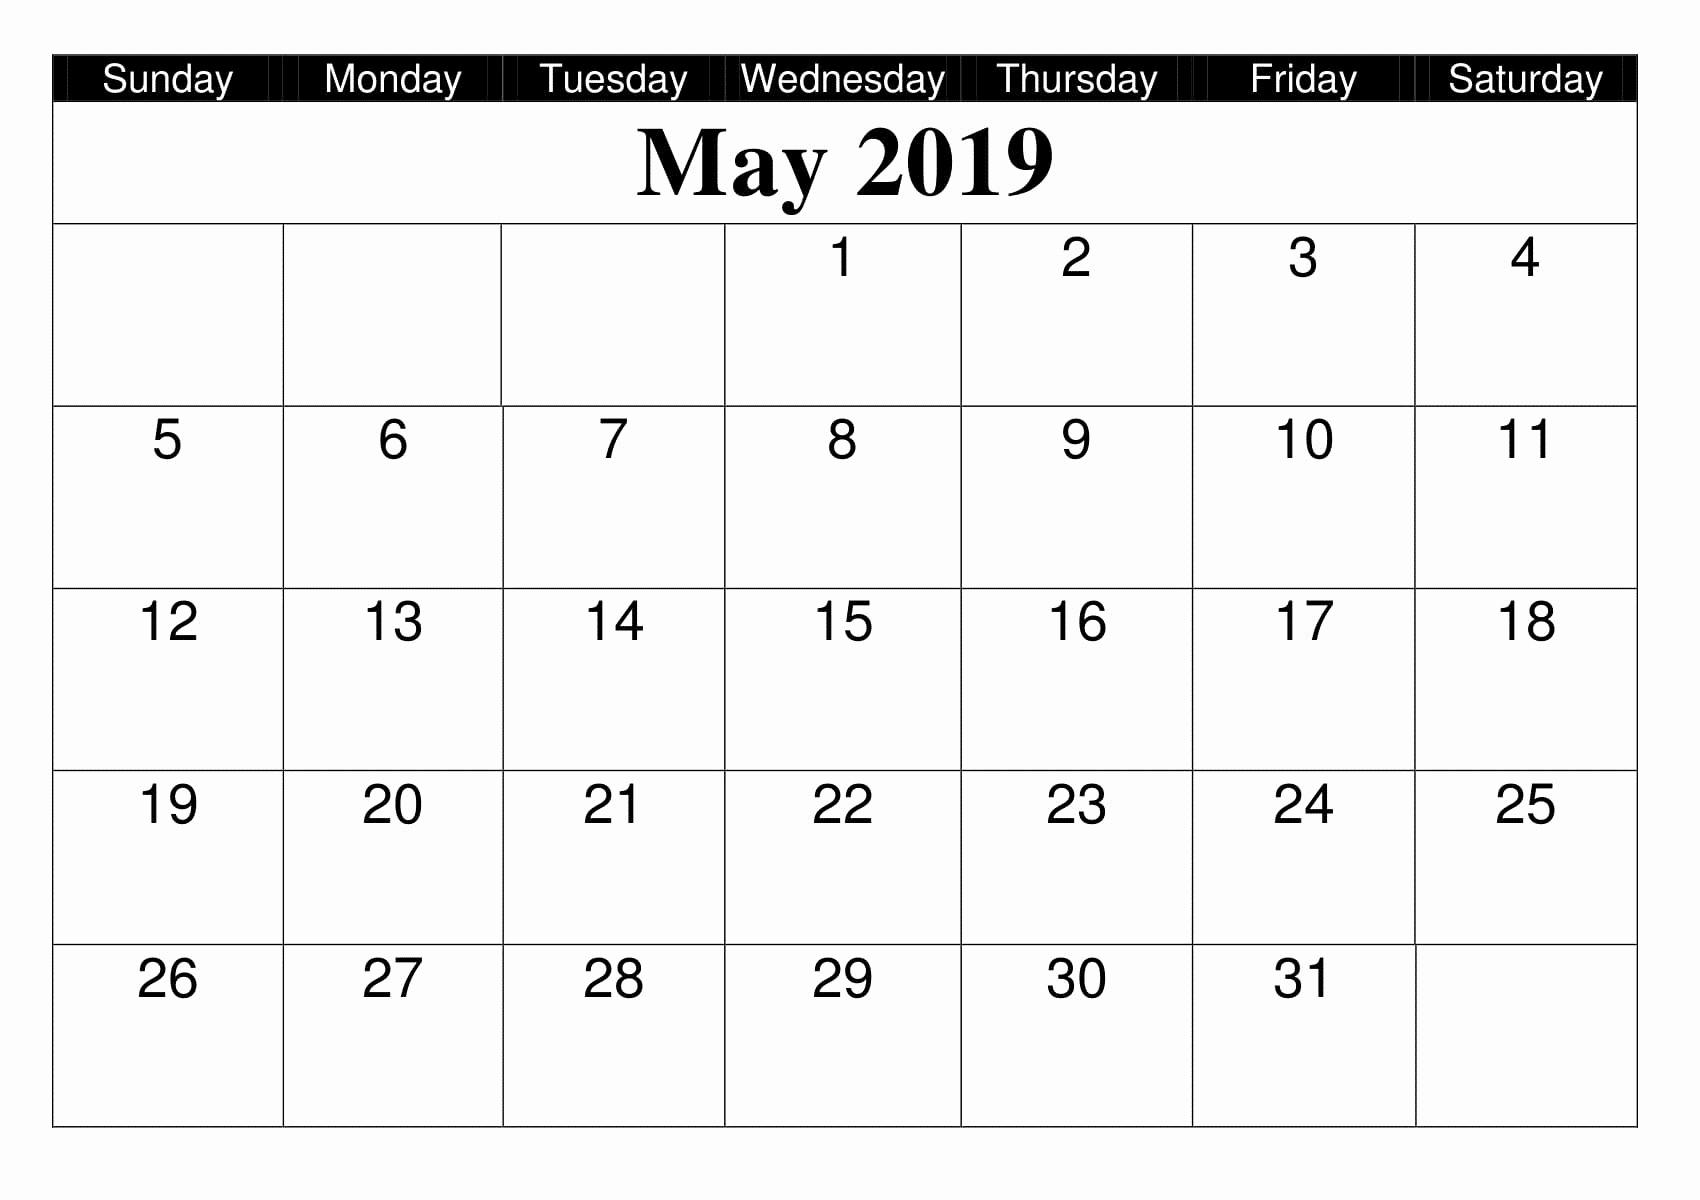 Blank Calendar Template 2019 Elegant Monthly Blank Calendar May 2019 Printable Editable Template